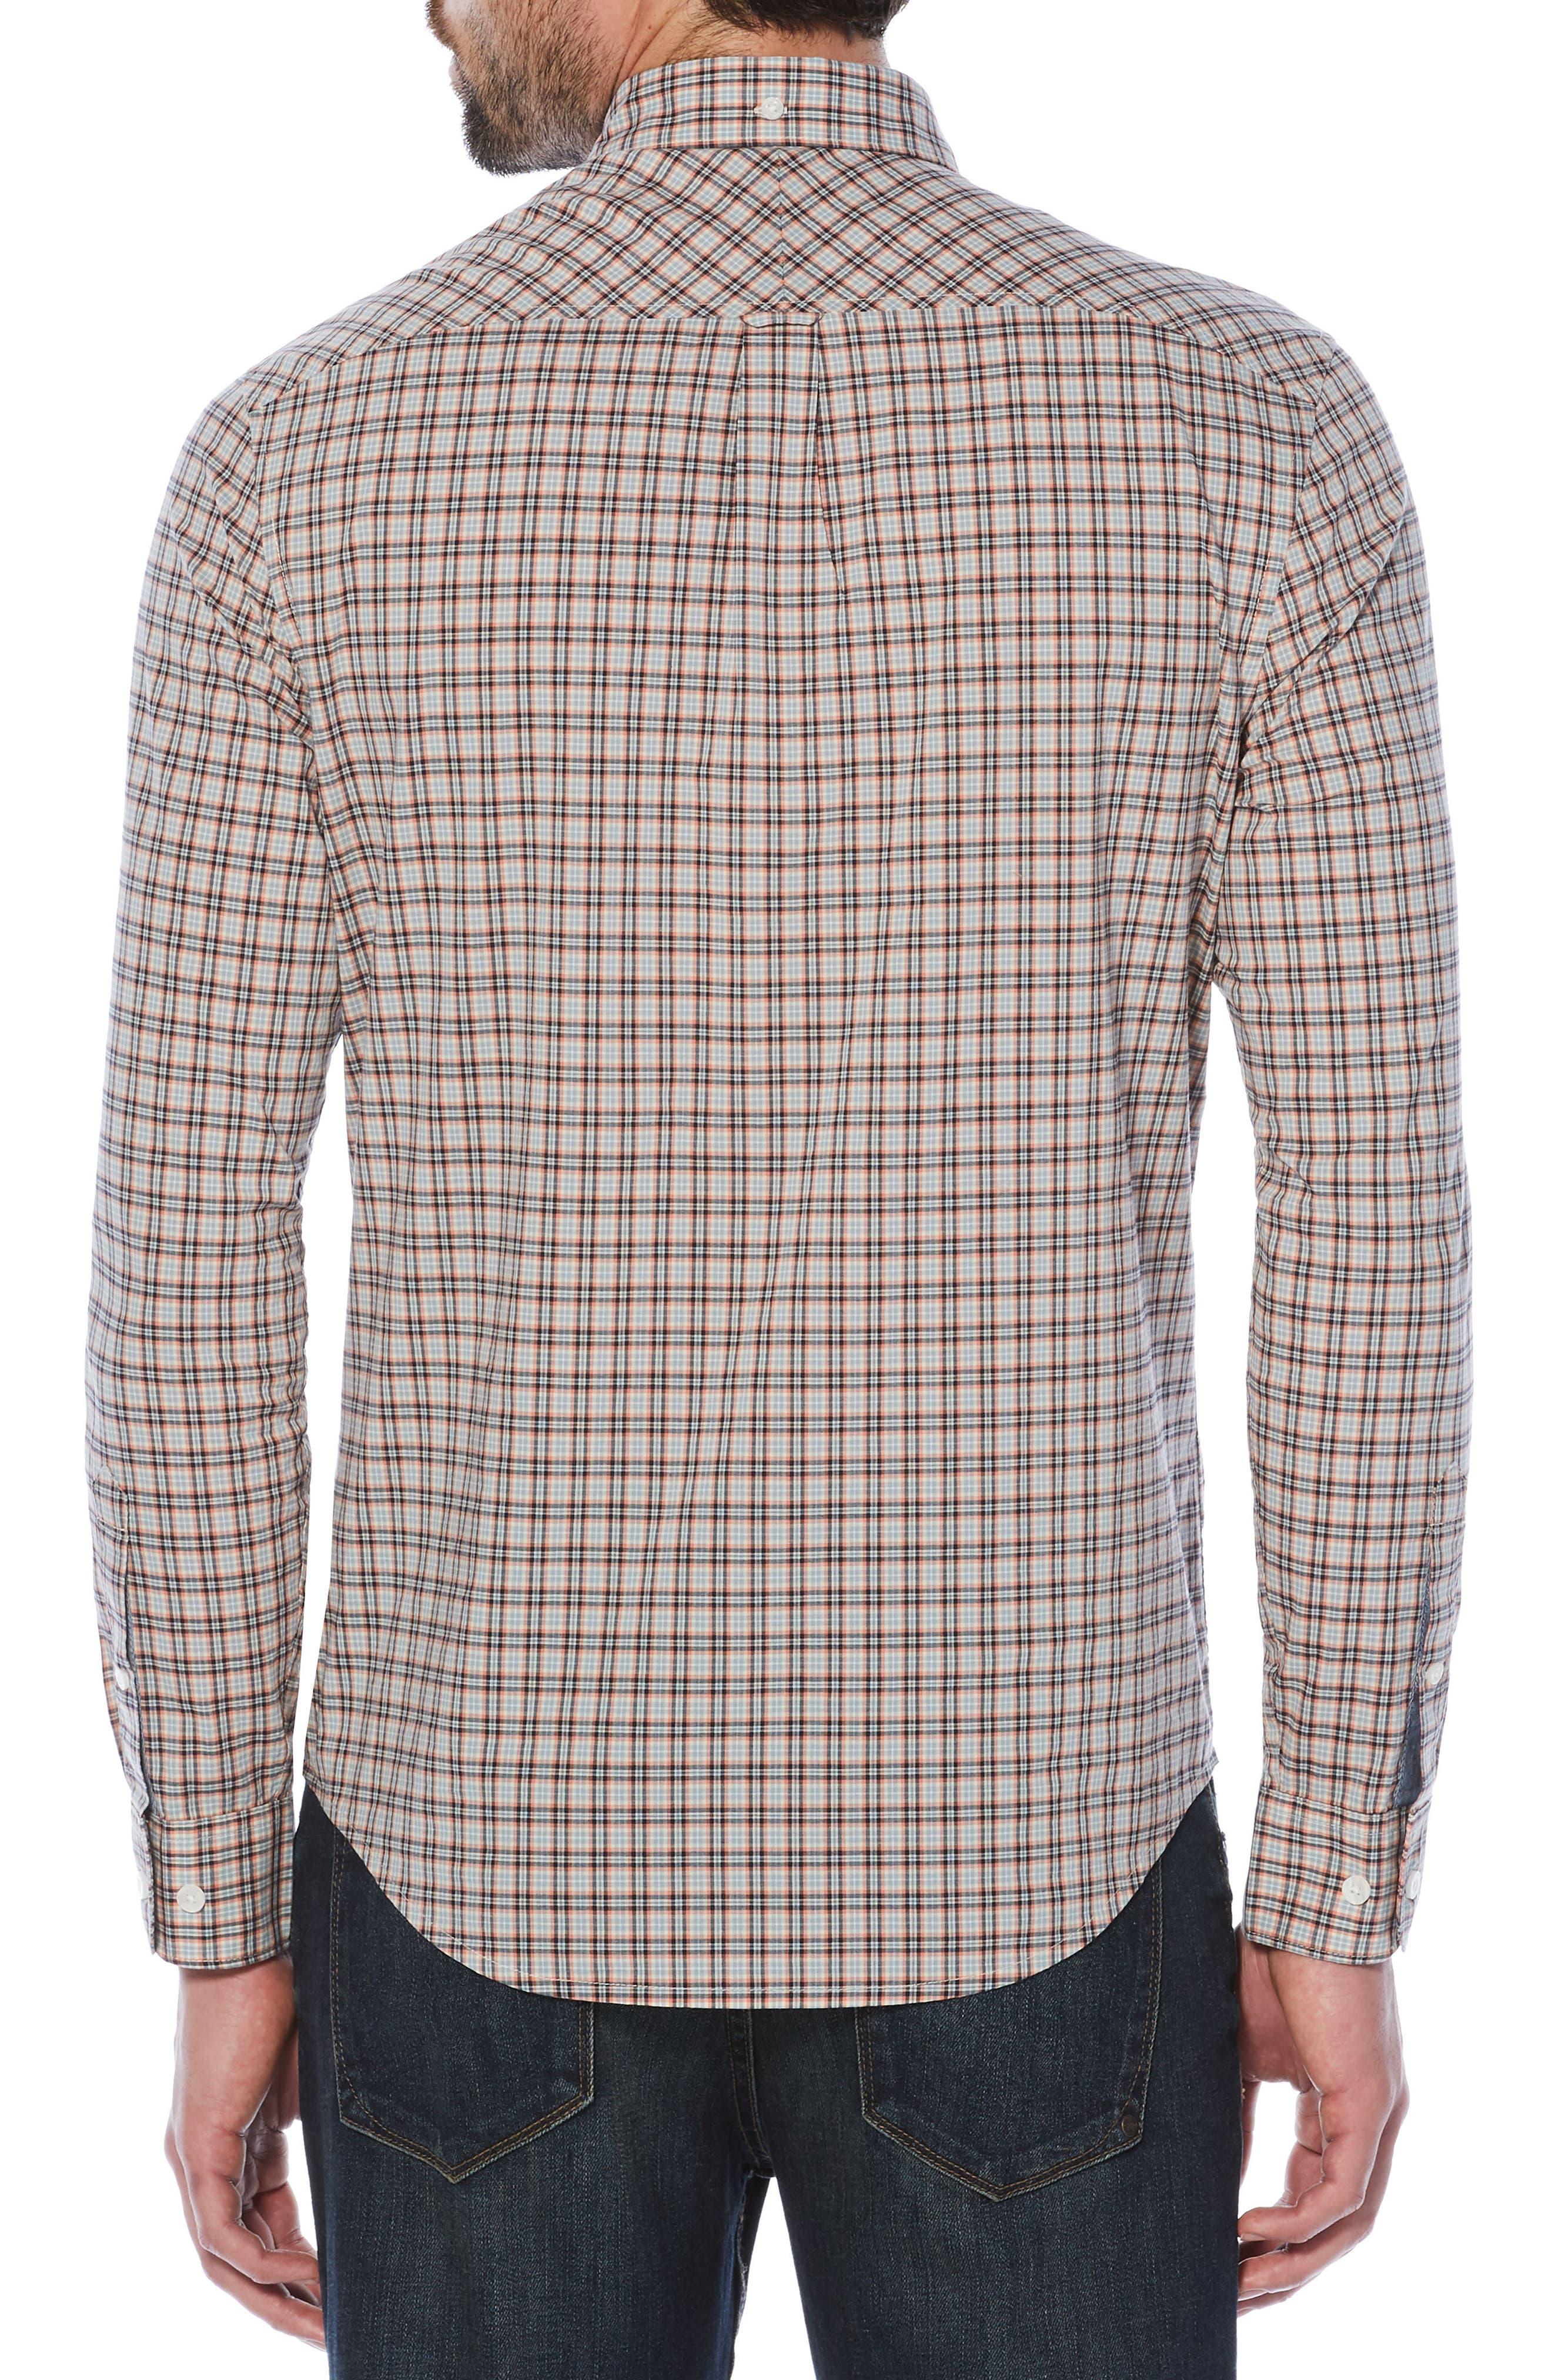 P55 Plaid Shirt,                             Alternate thumbnail 2, color,                             840